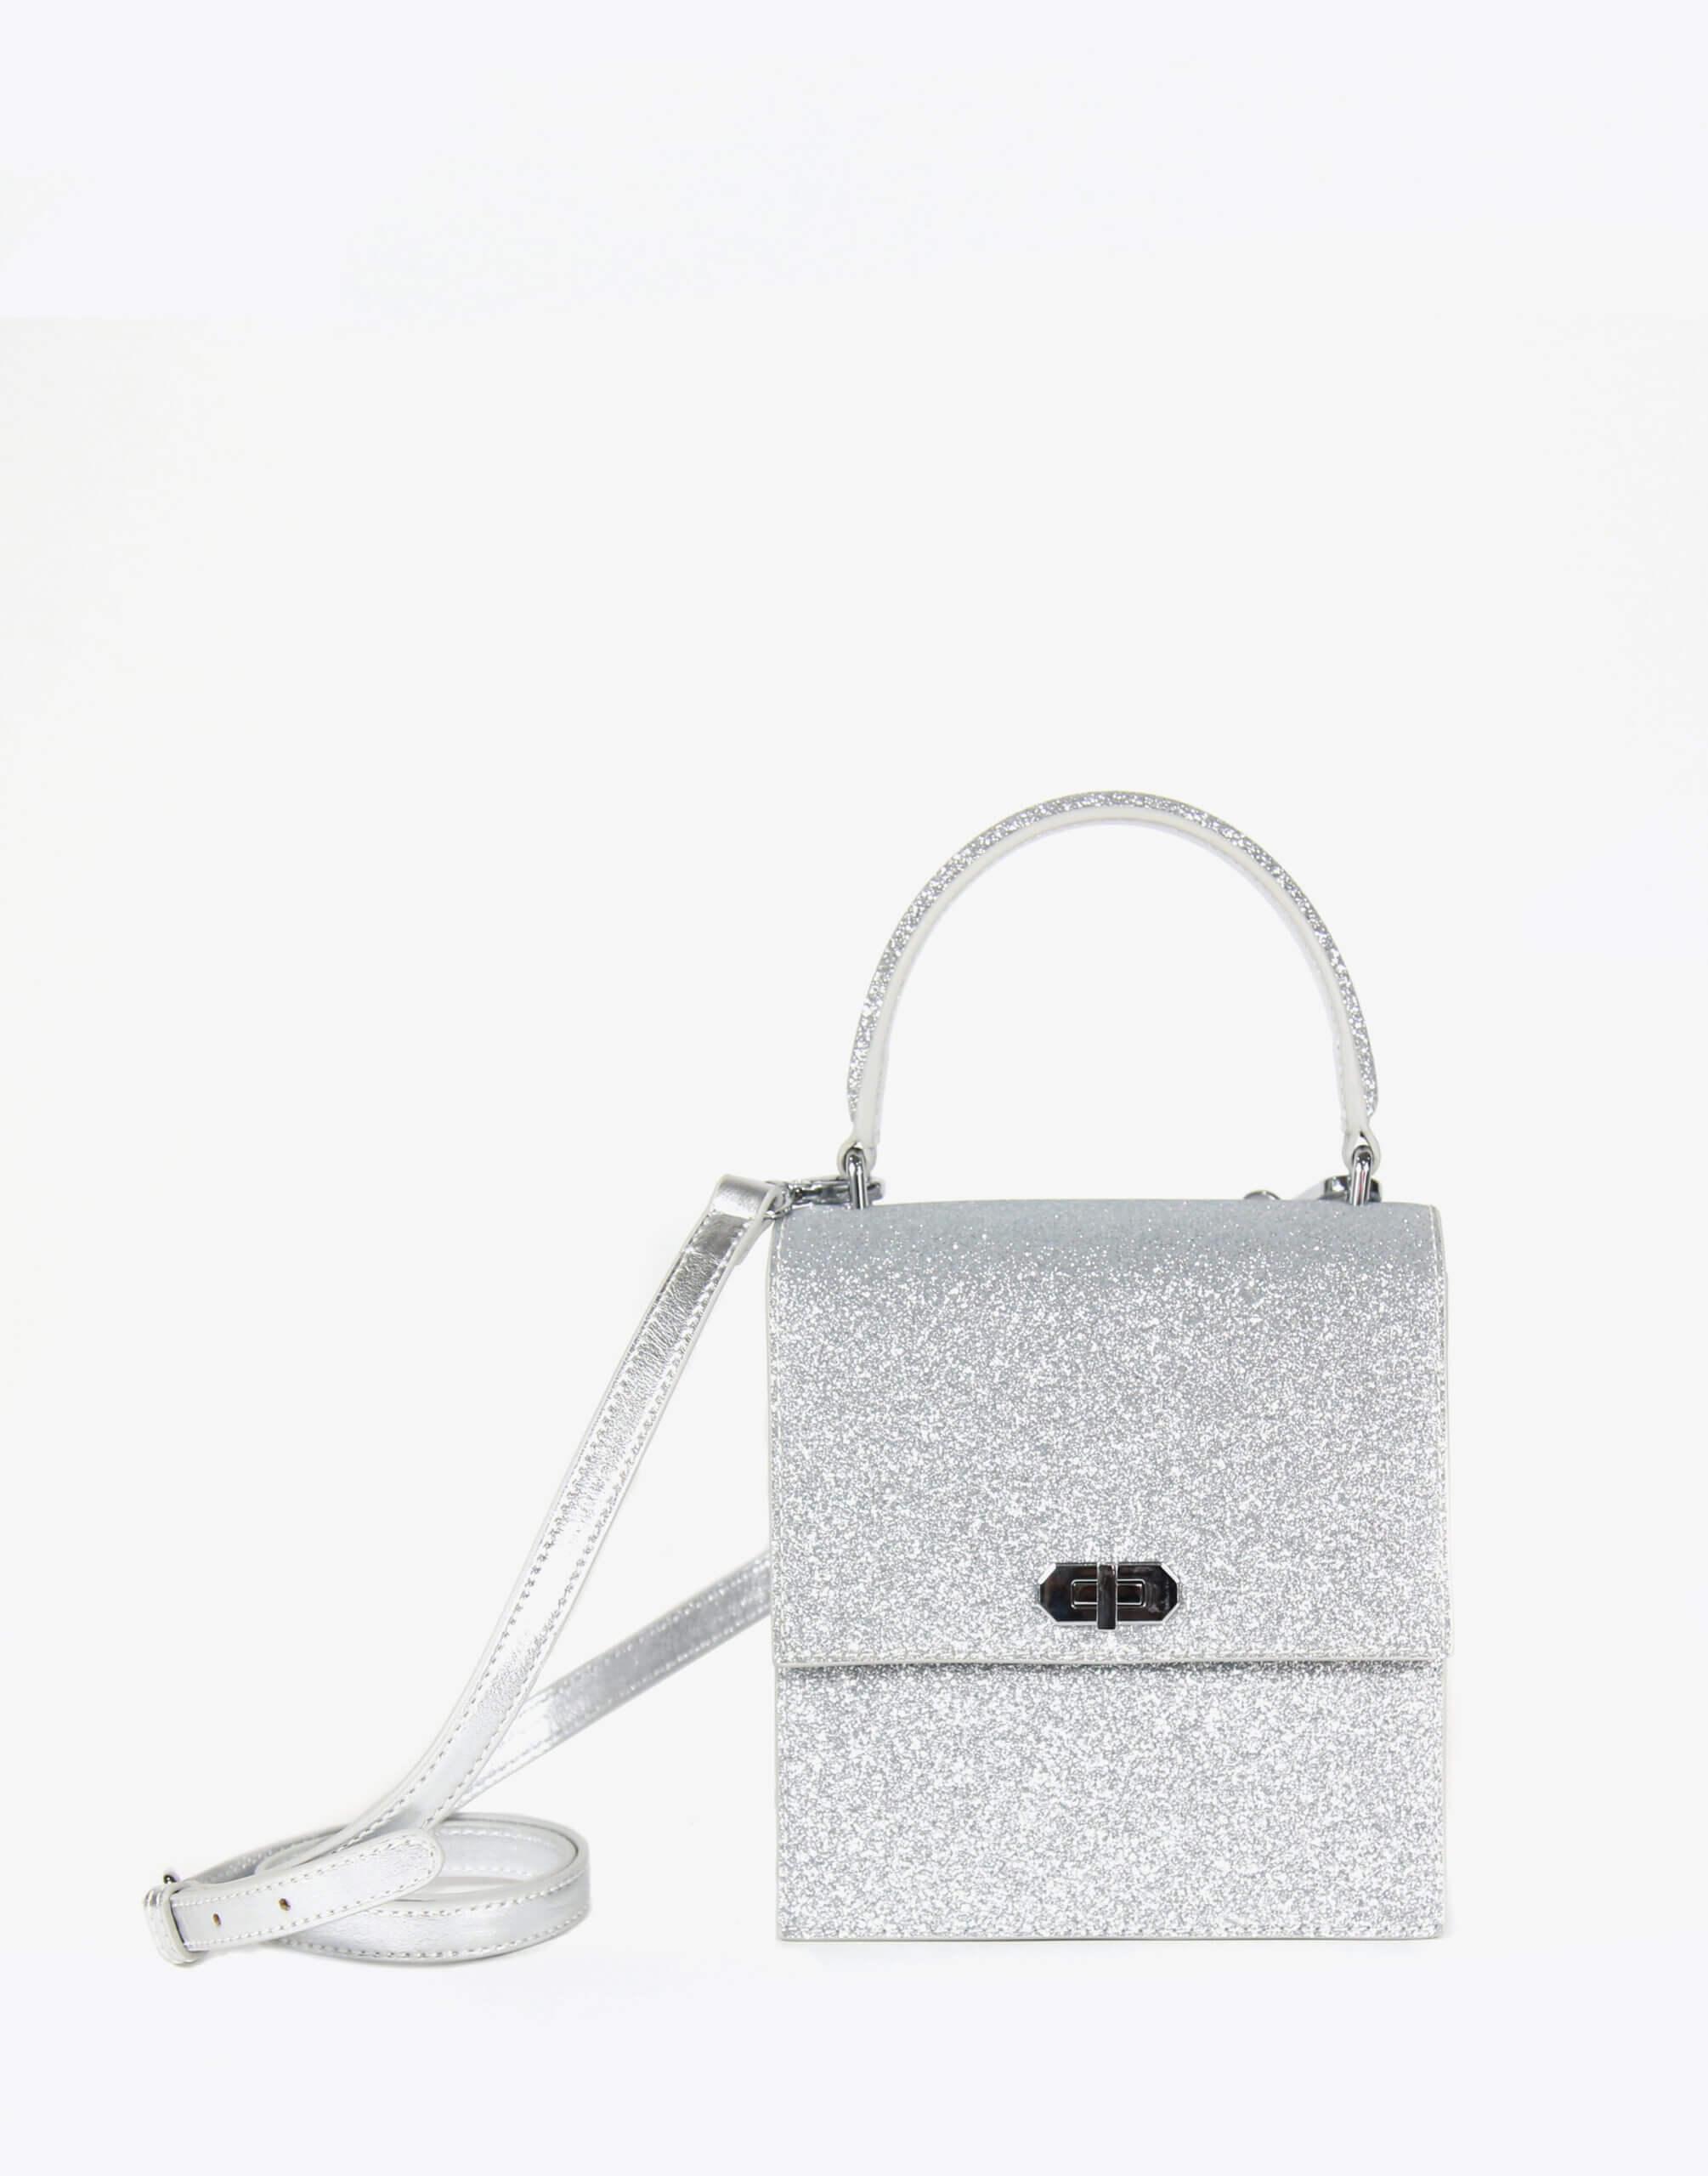 Neely & Chloe No. 19 Mini Lady Bag Strap View Silver